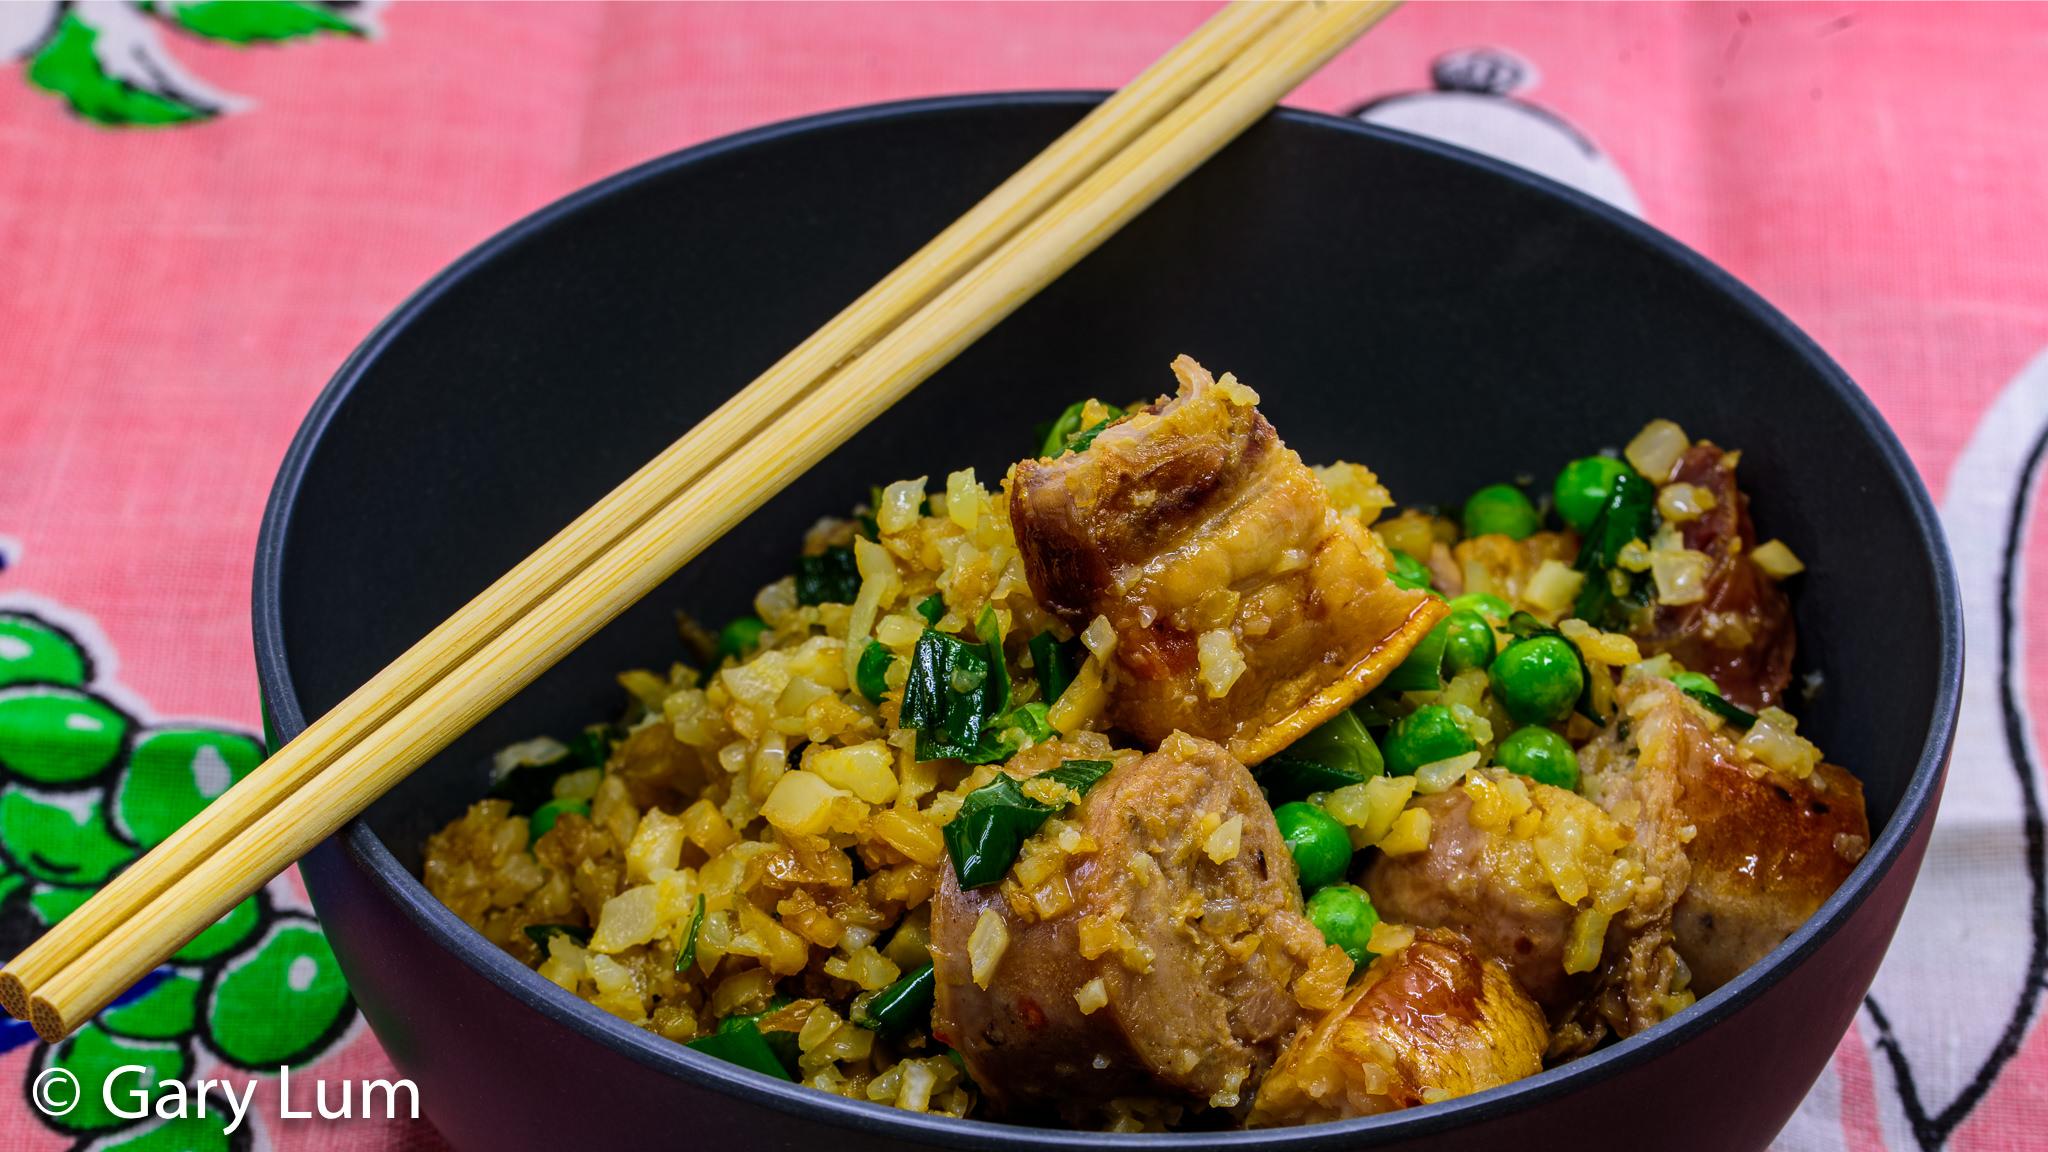 Triple pork fried cauliflower rice. Gary Lum.